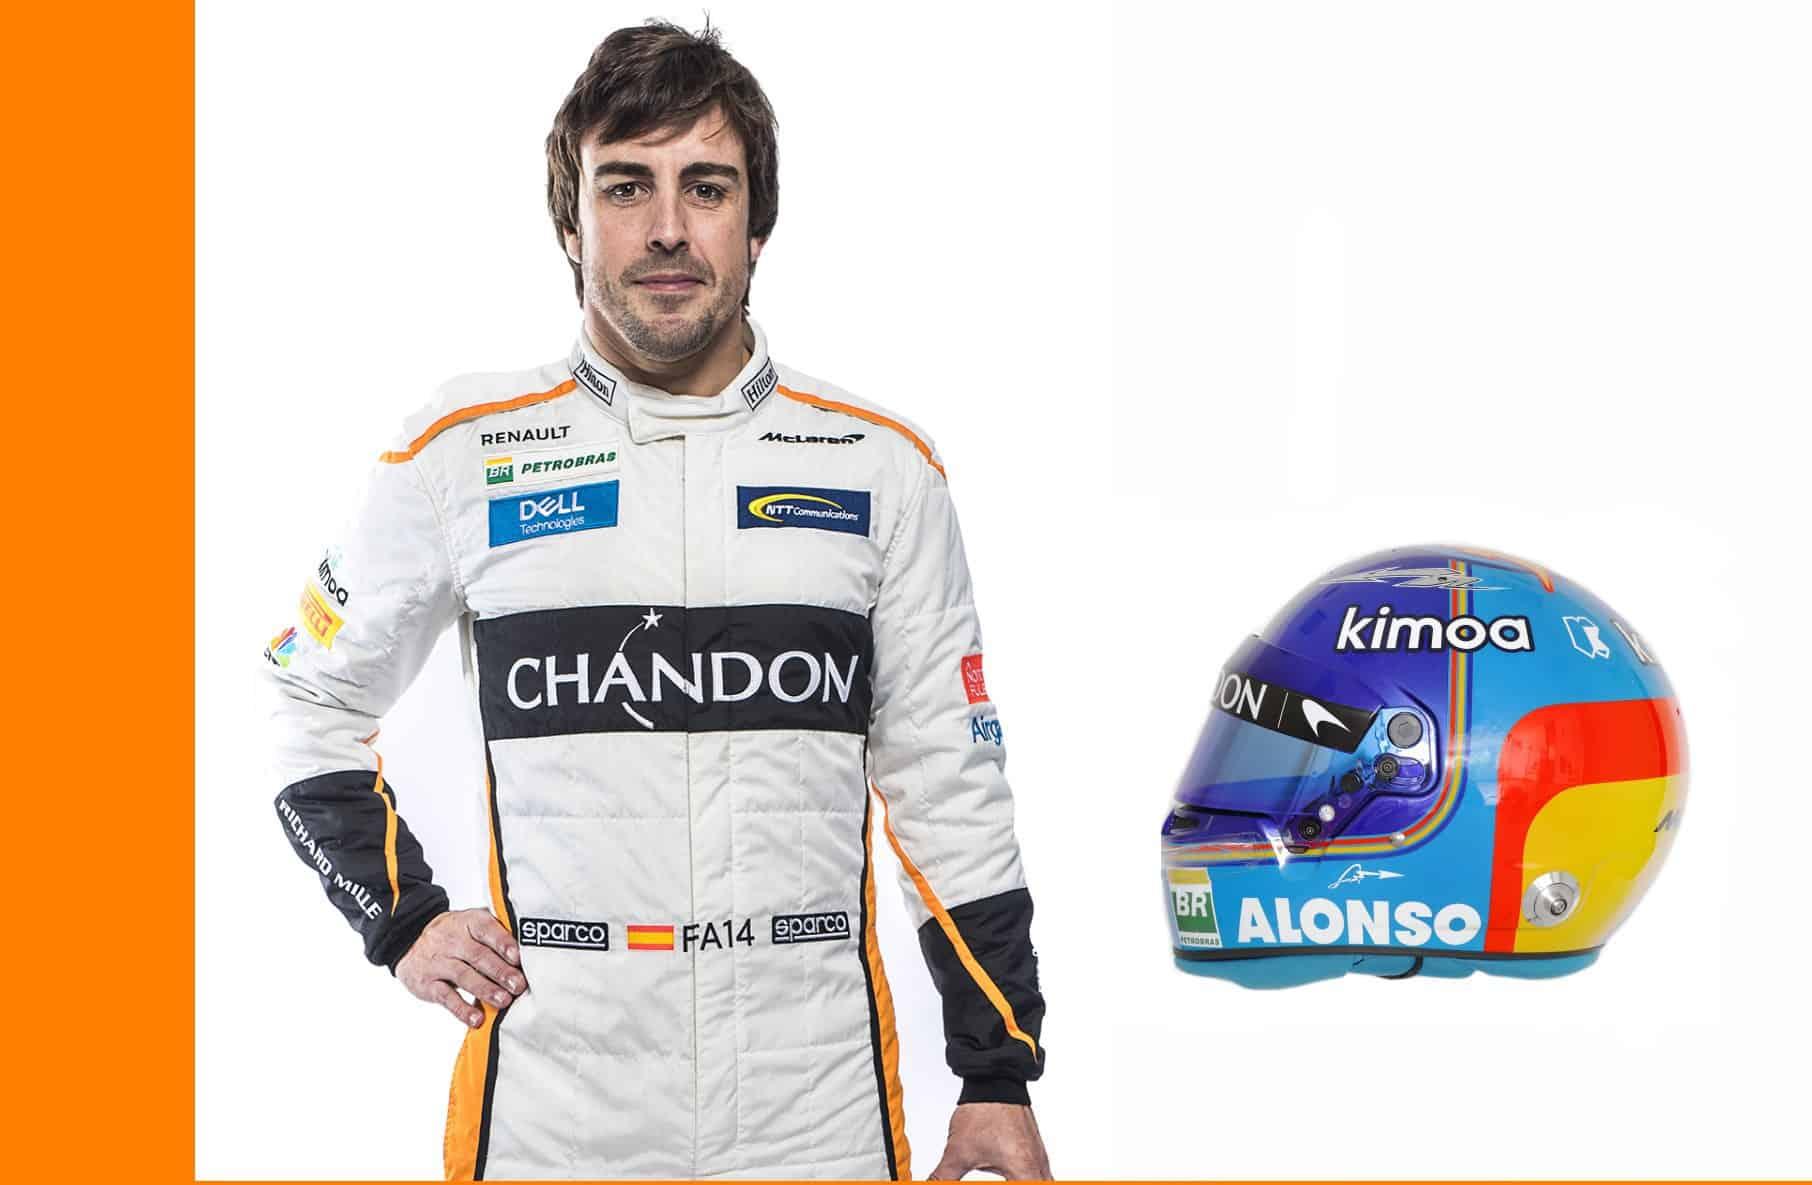 Fernando Alonso McLaren MCL33 Renault F1 2018 profile helmet full